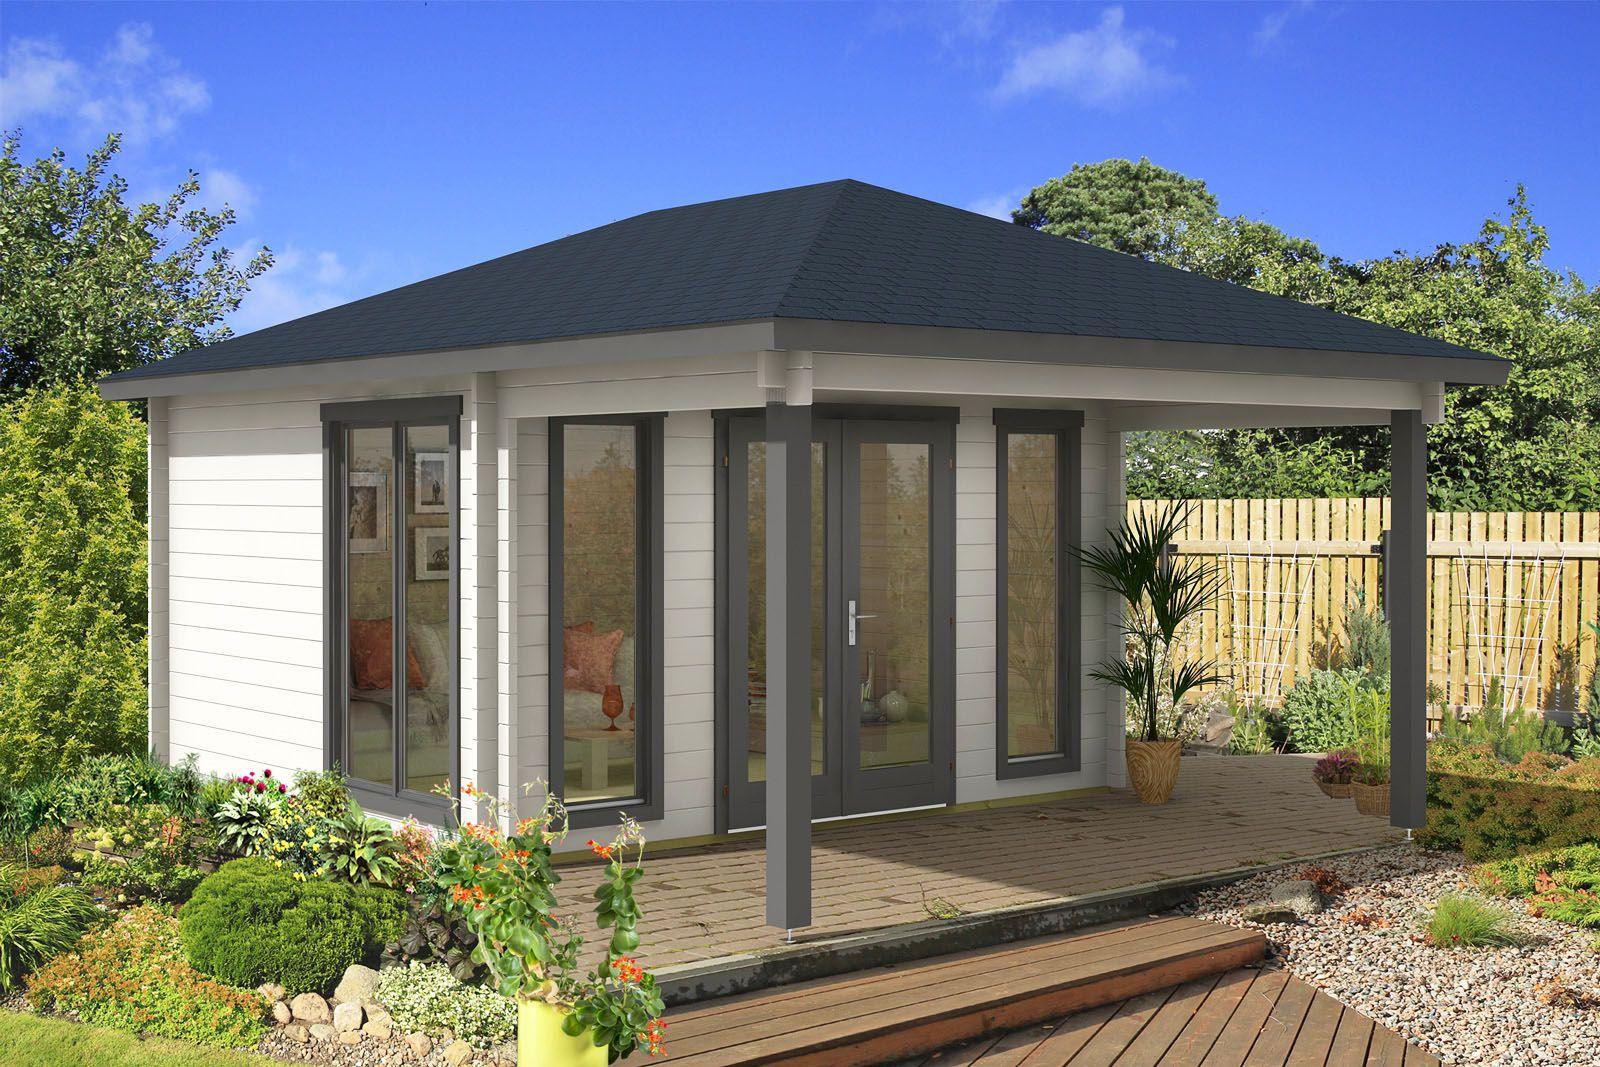 Gartenhaus modell madrid madrid saunas and haus